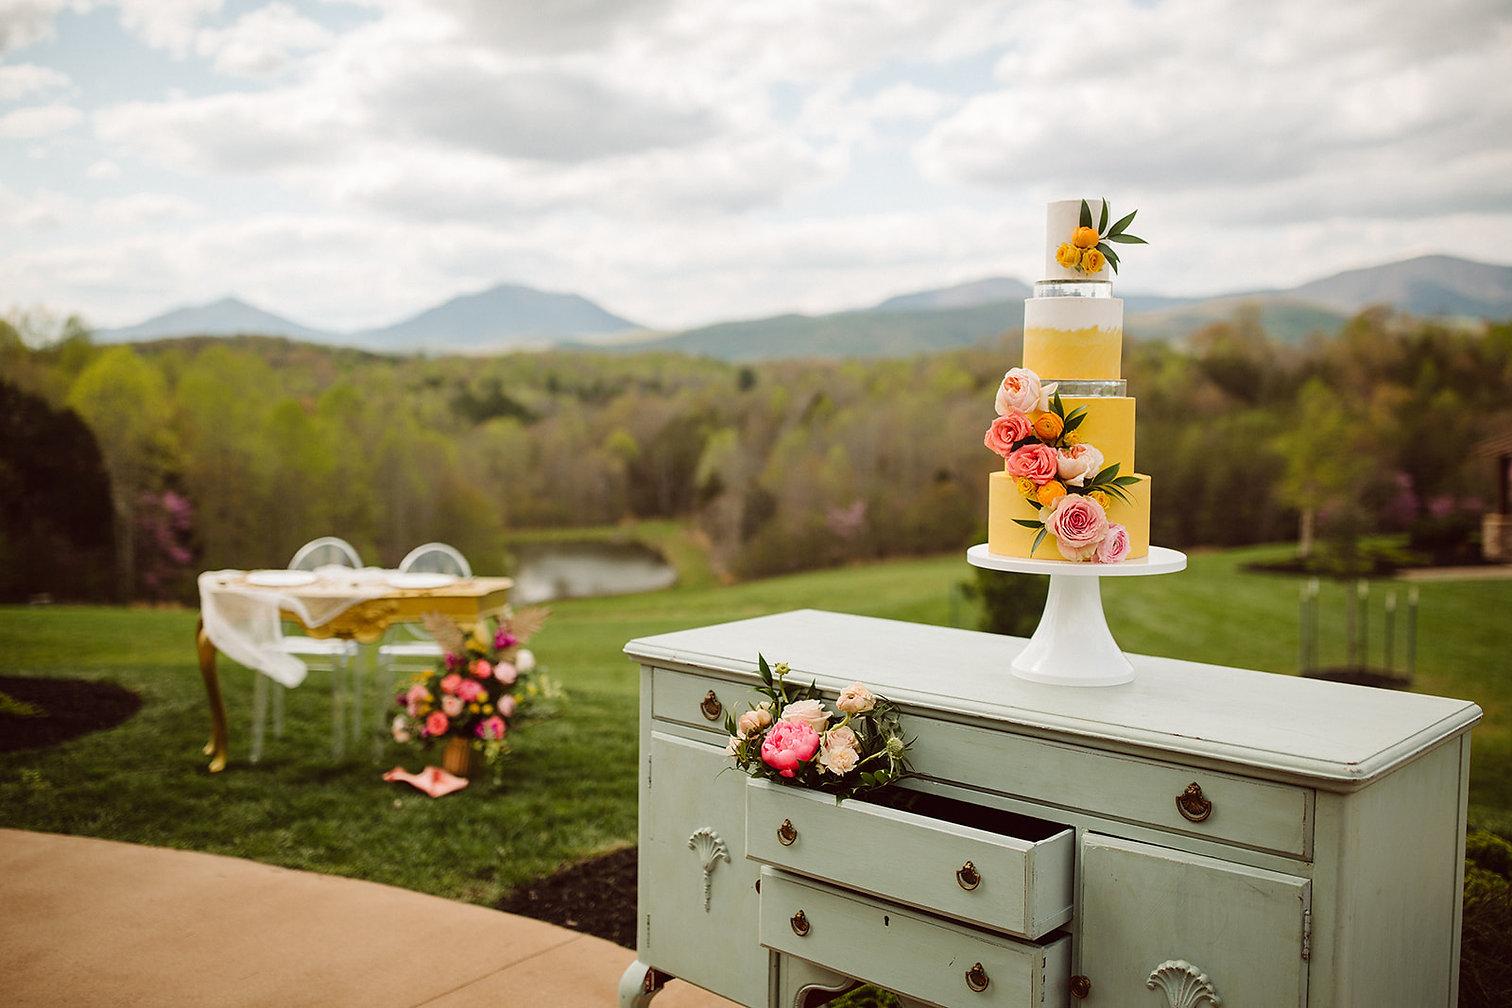 Glass Hill wedding venue Roanoke luxury wedding cake baker bakery custom wedding cake Blue